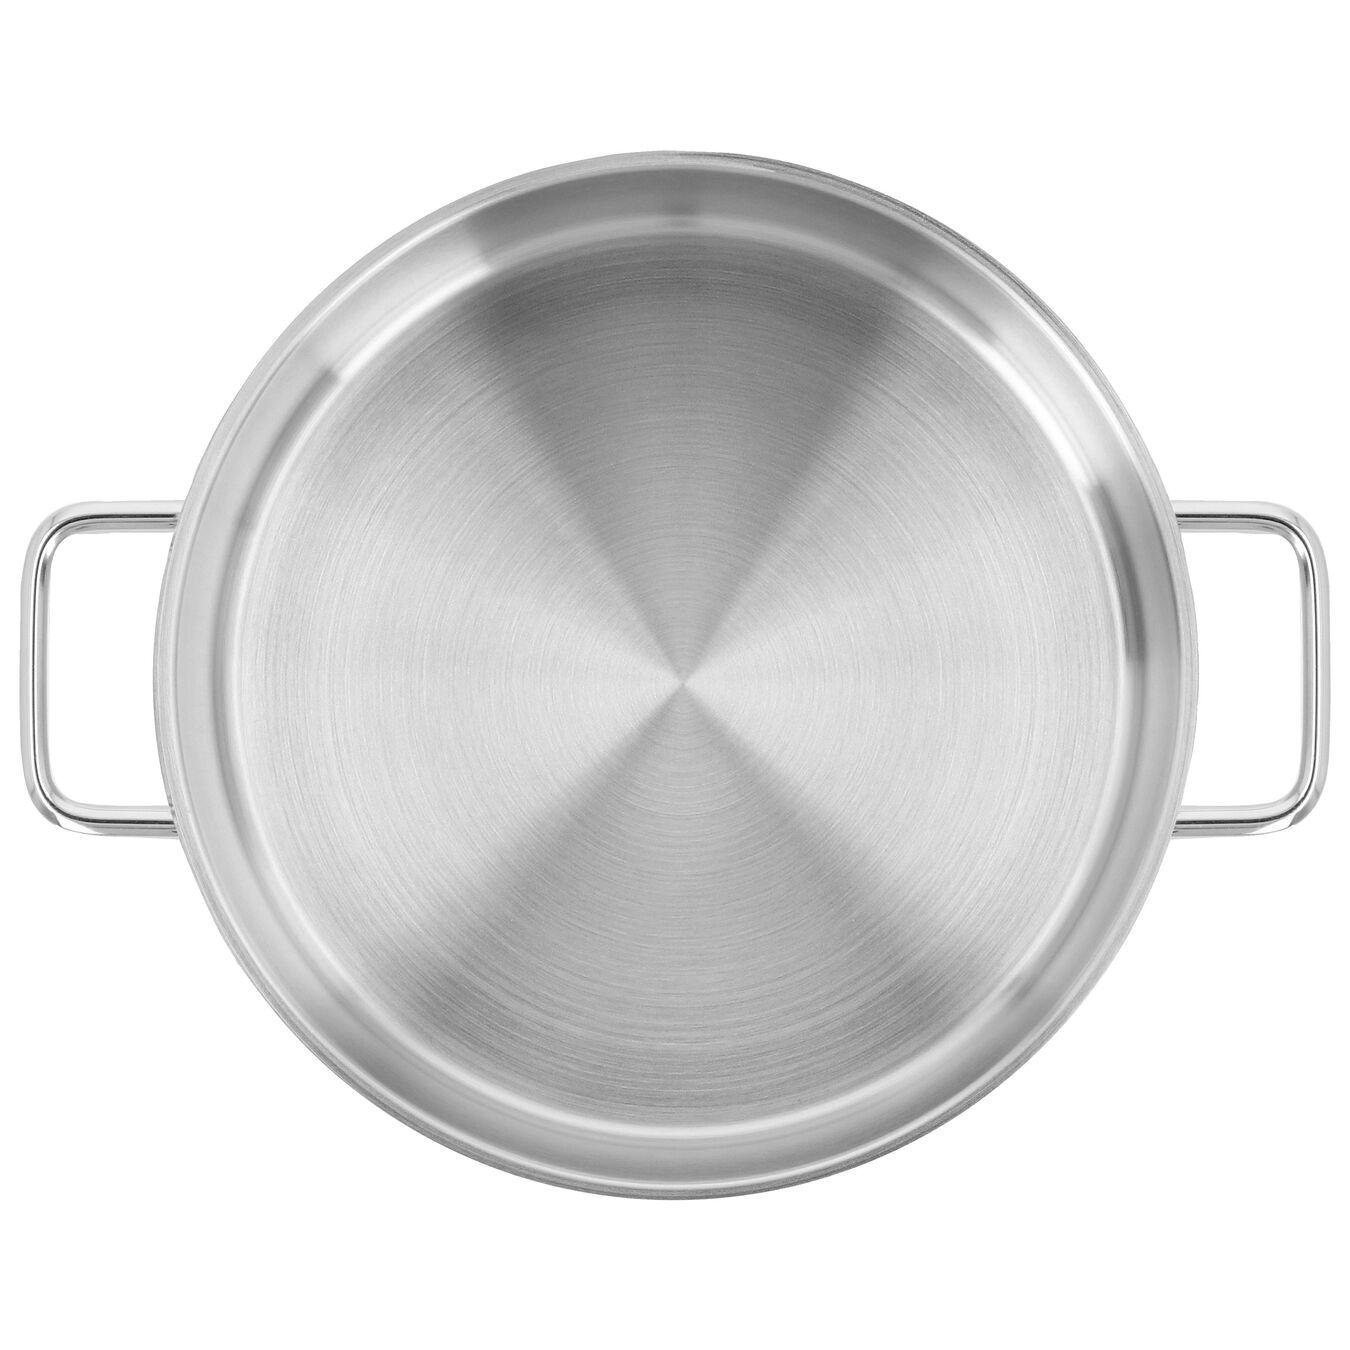 Kookpan met glazen deksel 24 cm / 2.8 l,,large 4